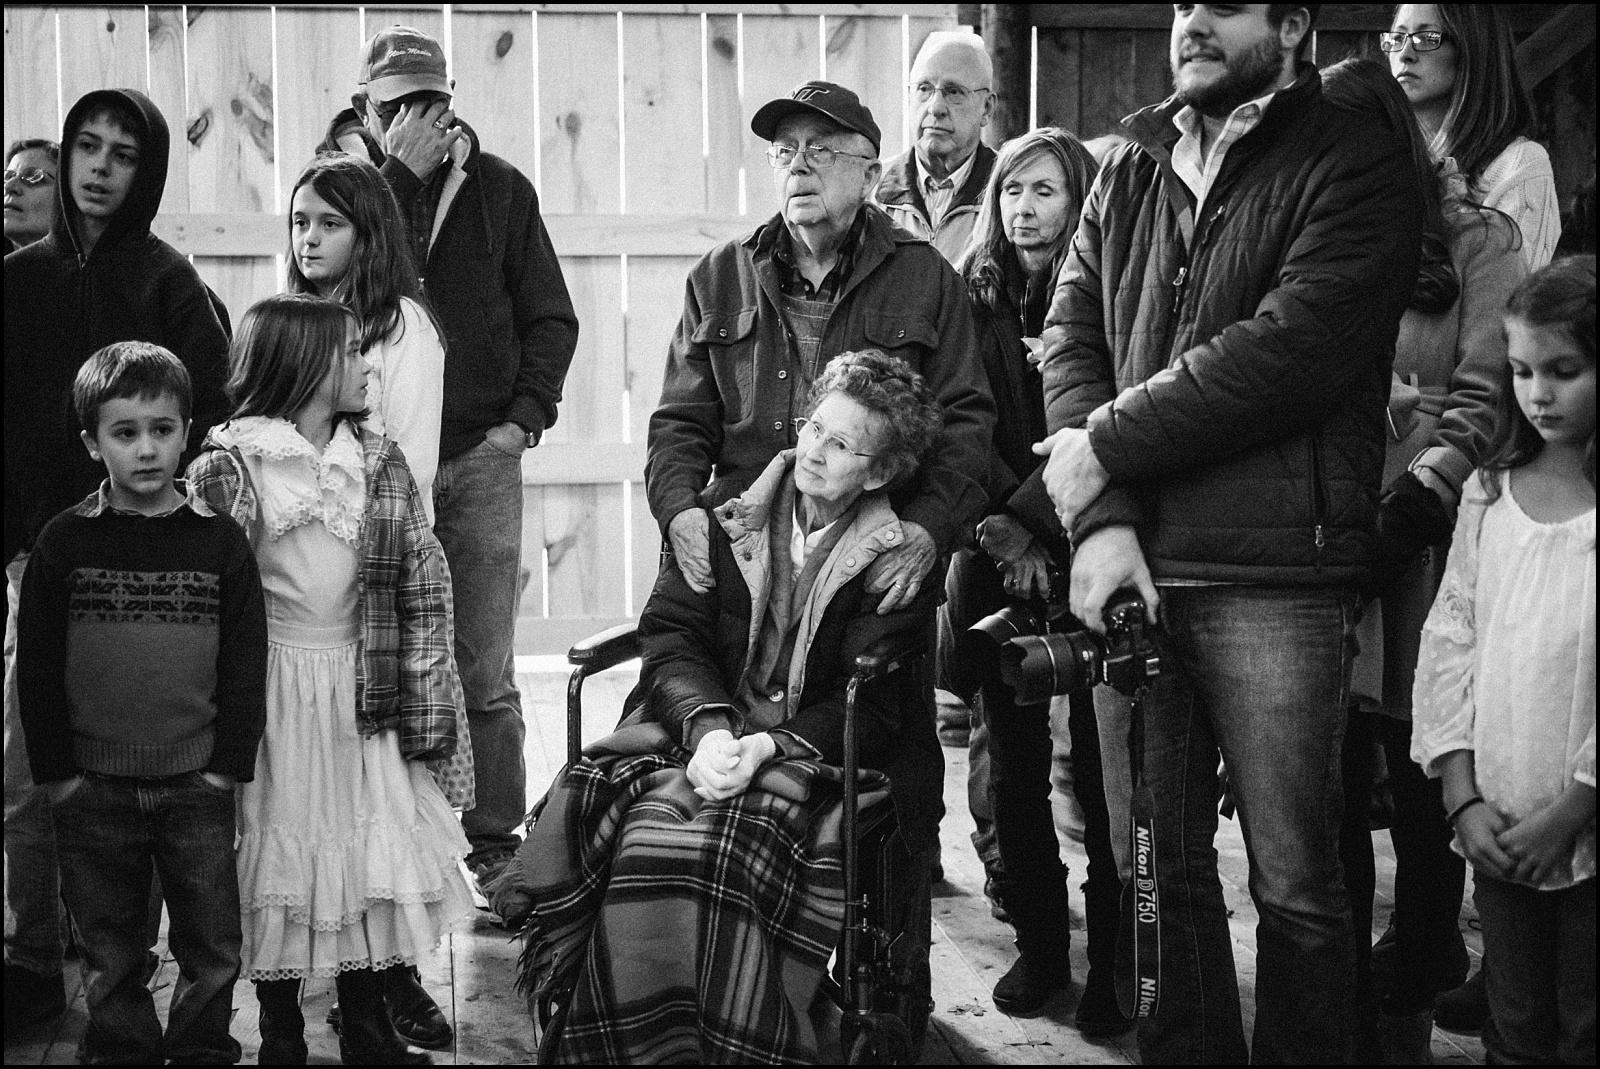 Grandparents in black and white